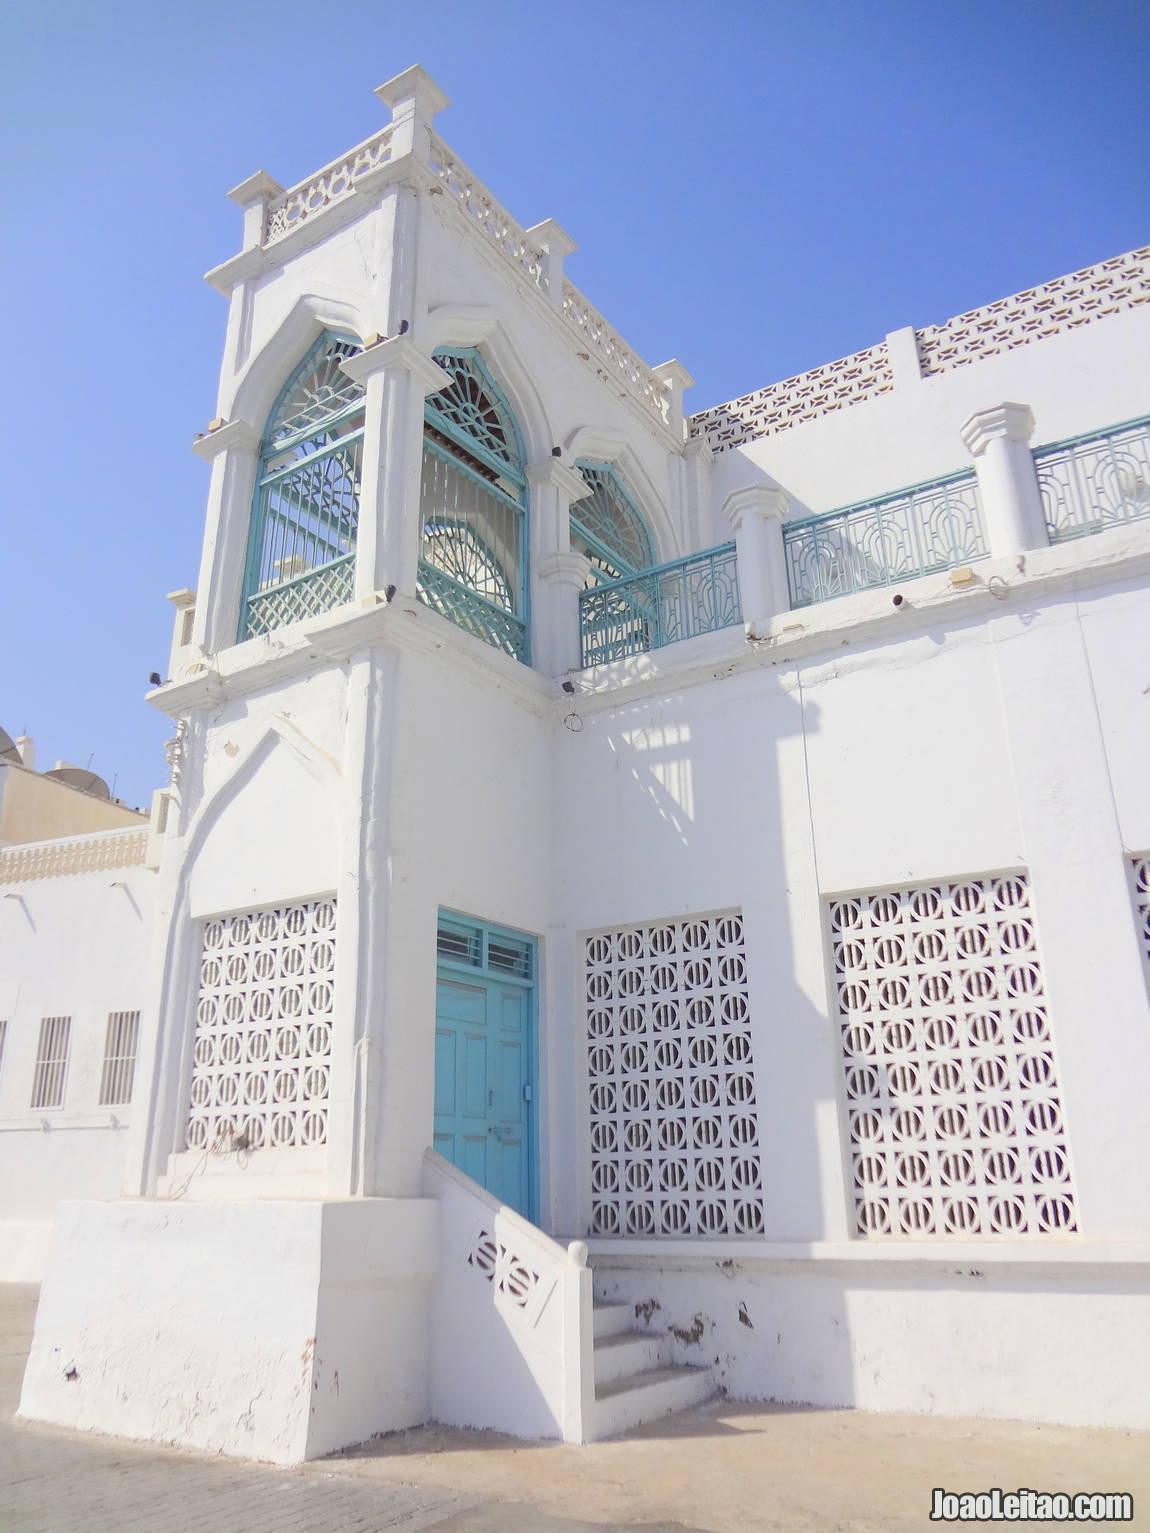 Visit Muscat in Oman